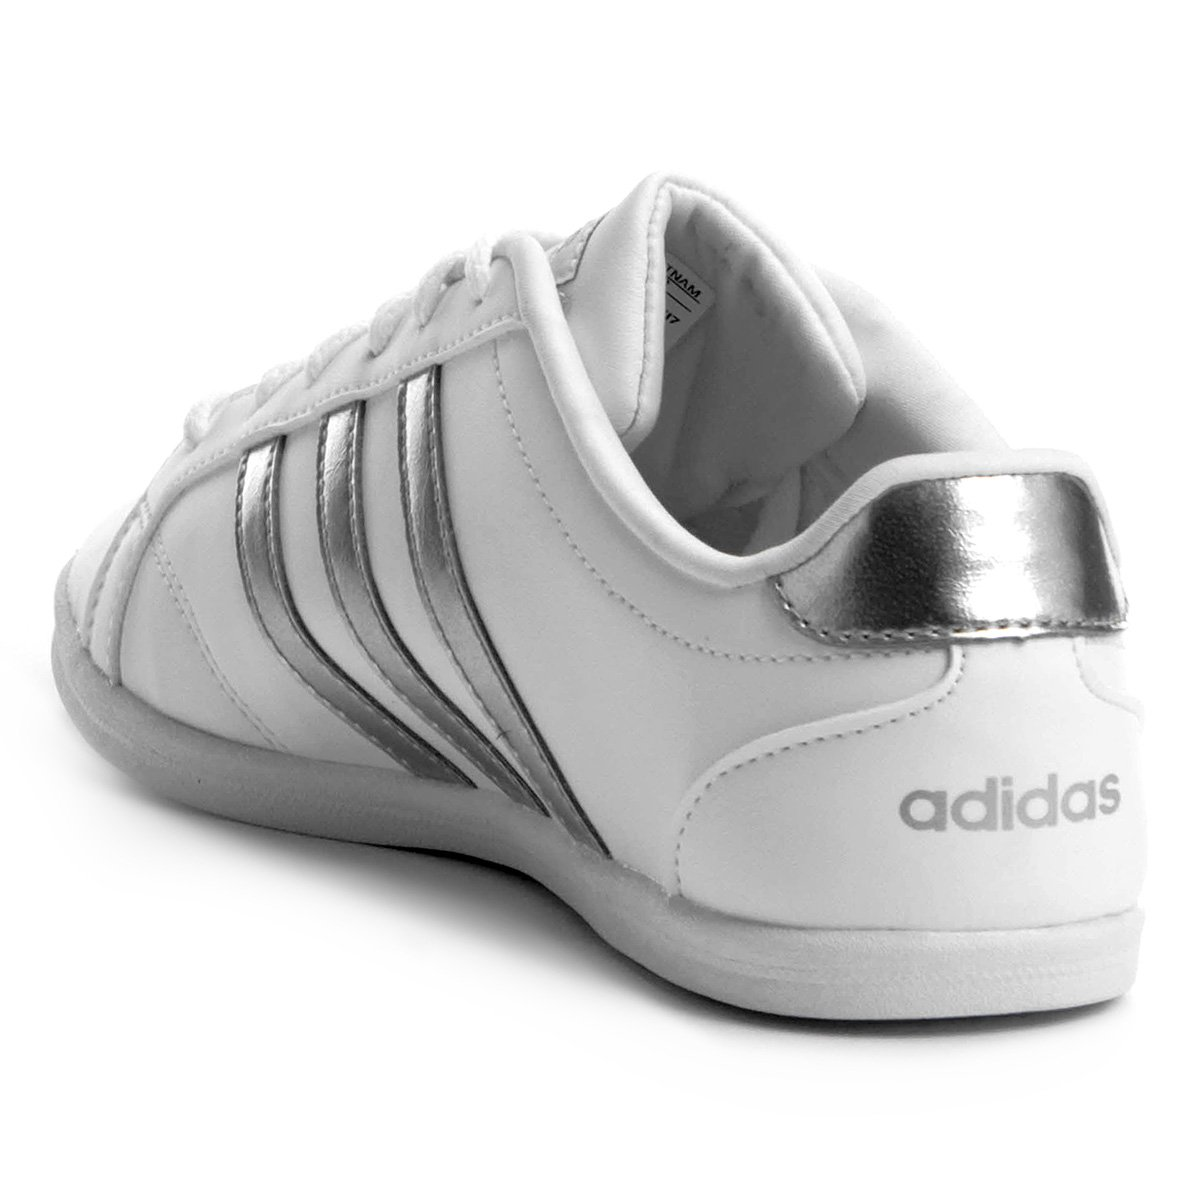 7285de1ae3b Tênis Adidas Vs Coneo Qt Feminino - Shopping TudoAzul